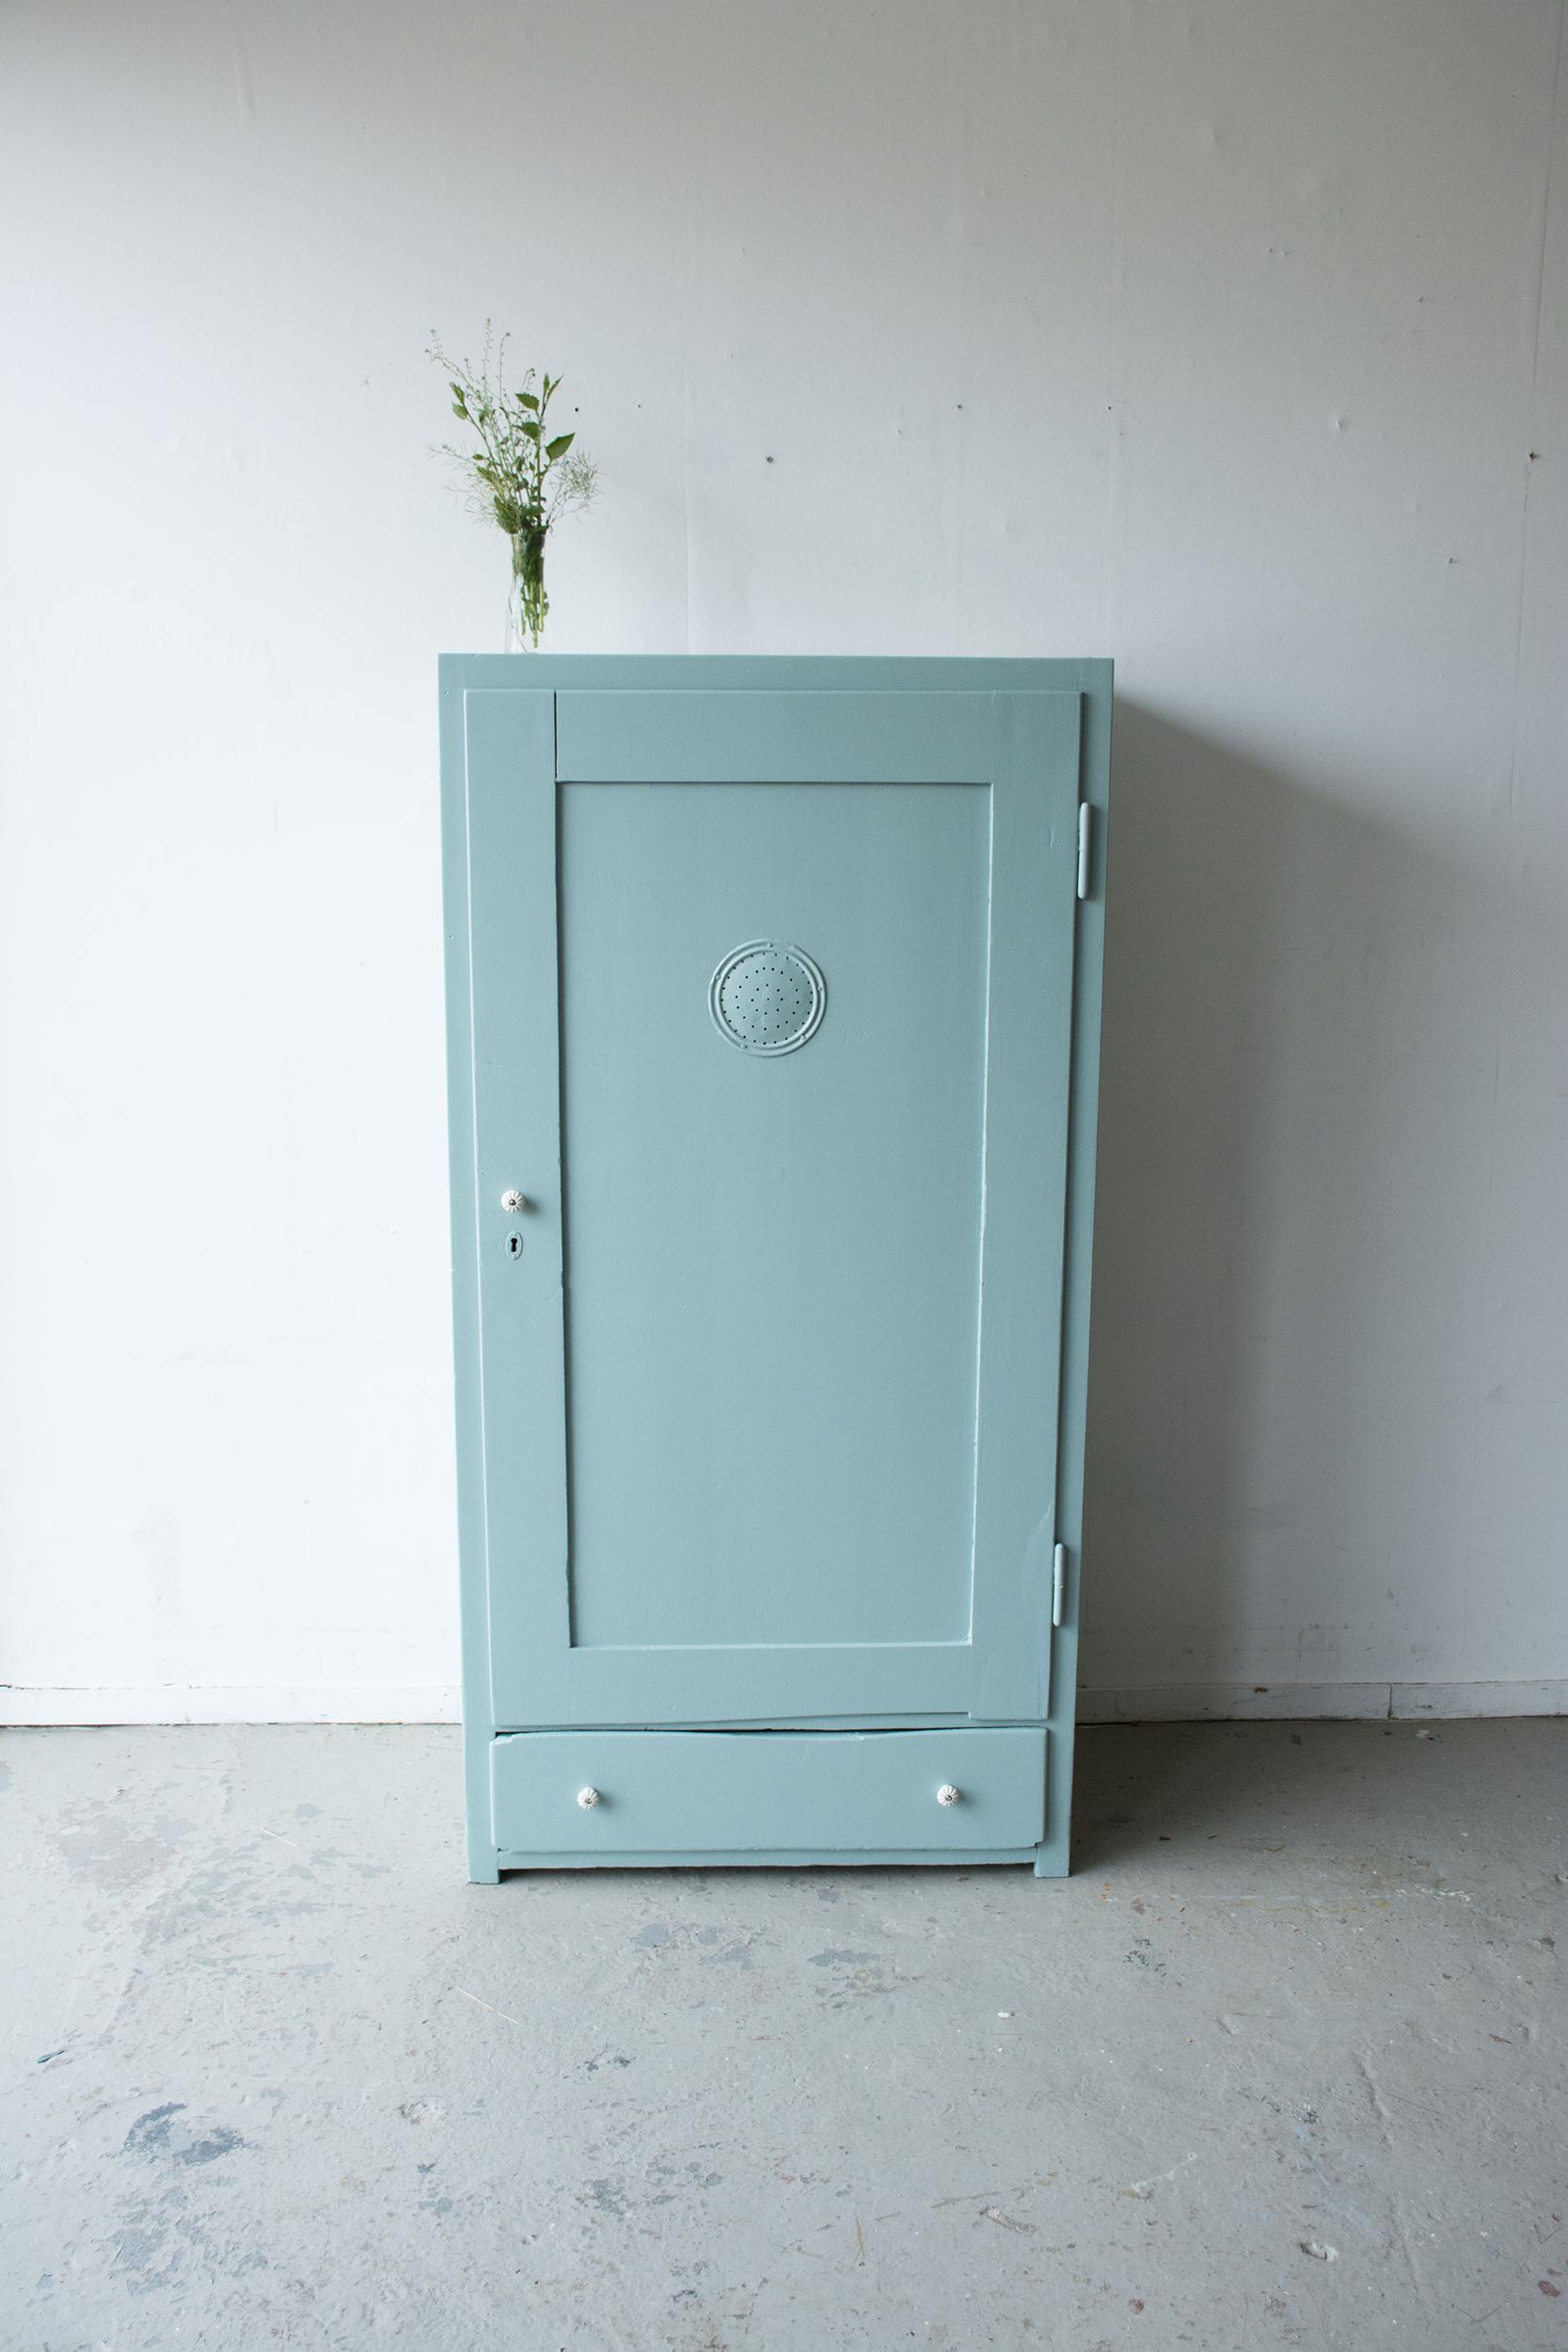 dix blue iets groener - Firma zoethout_2.jpg